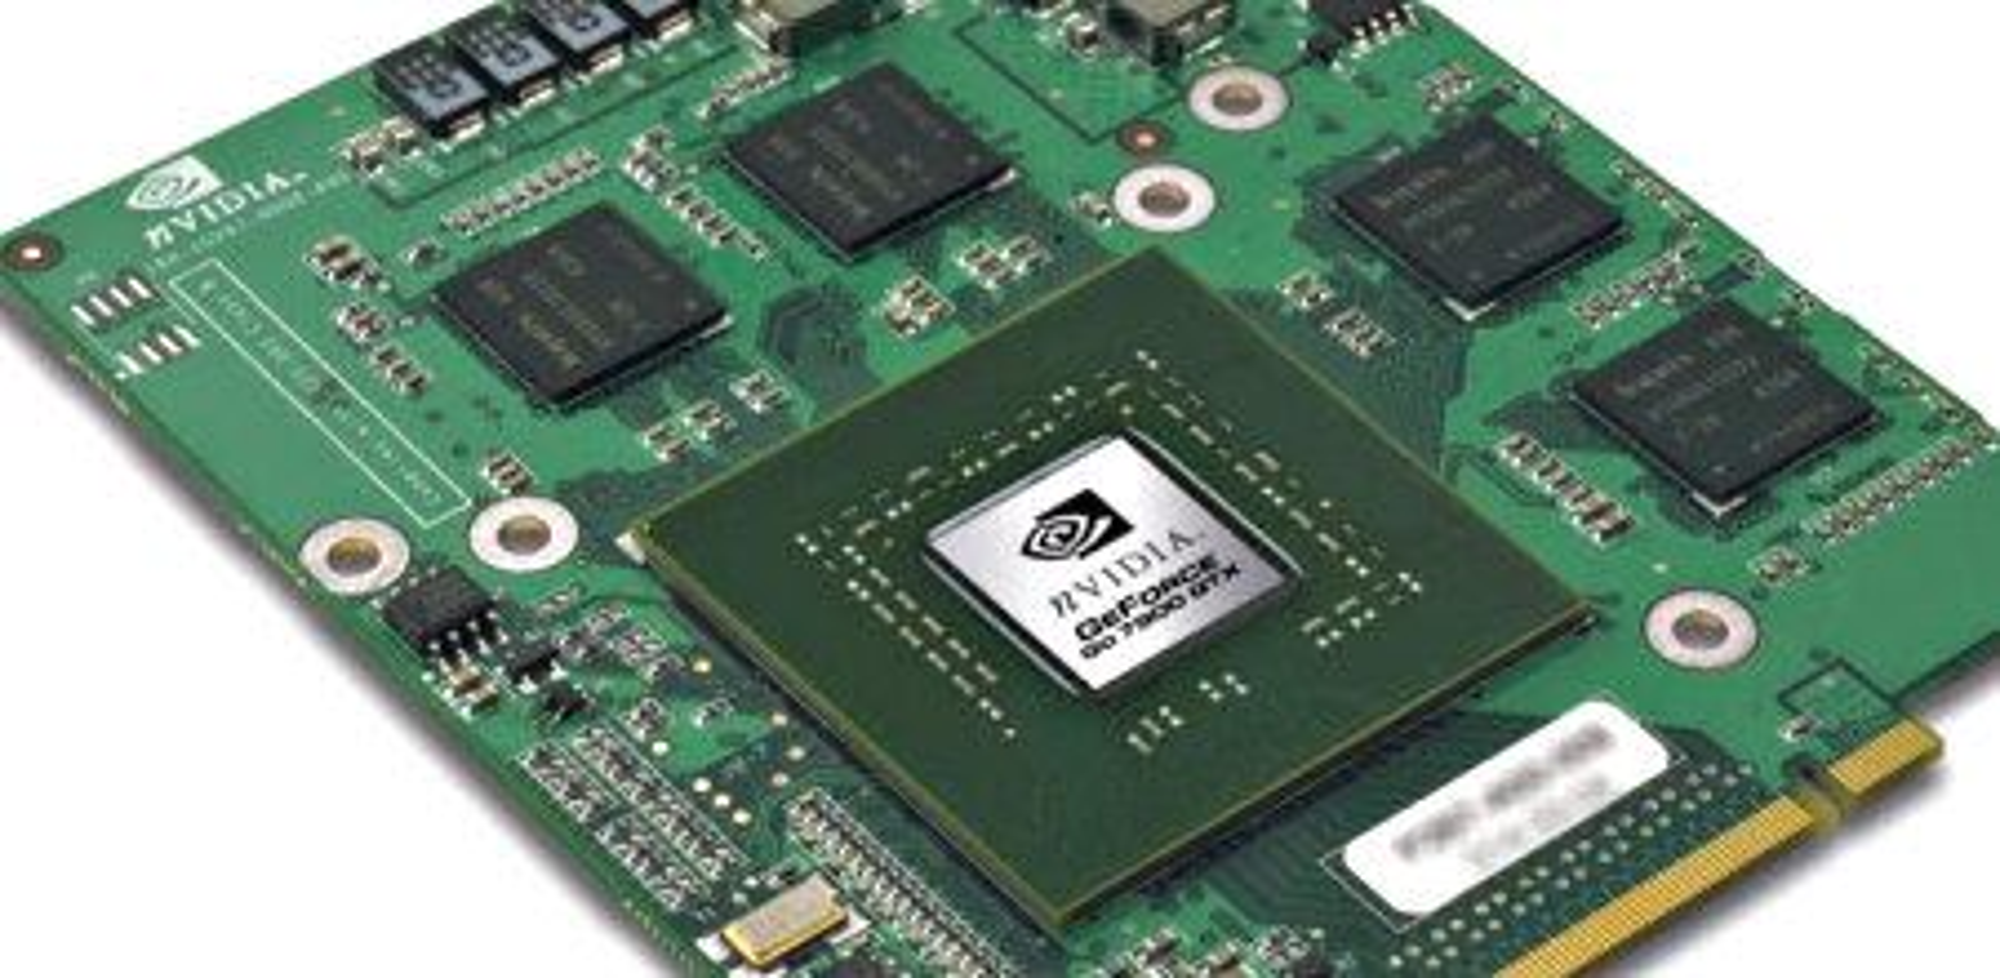 Bildet viser GeForce Go 7900